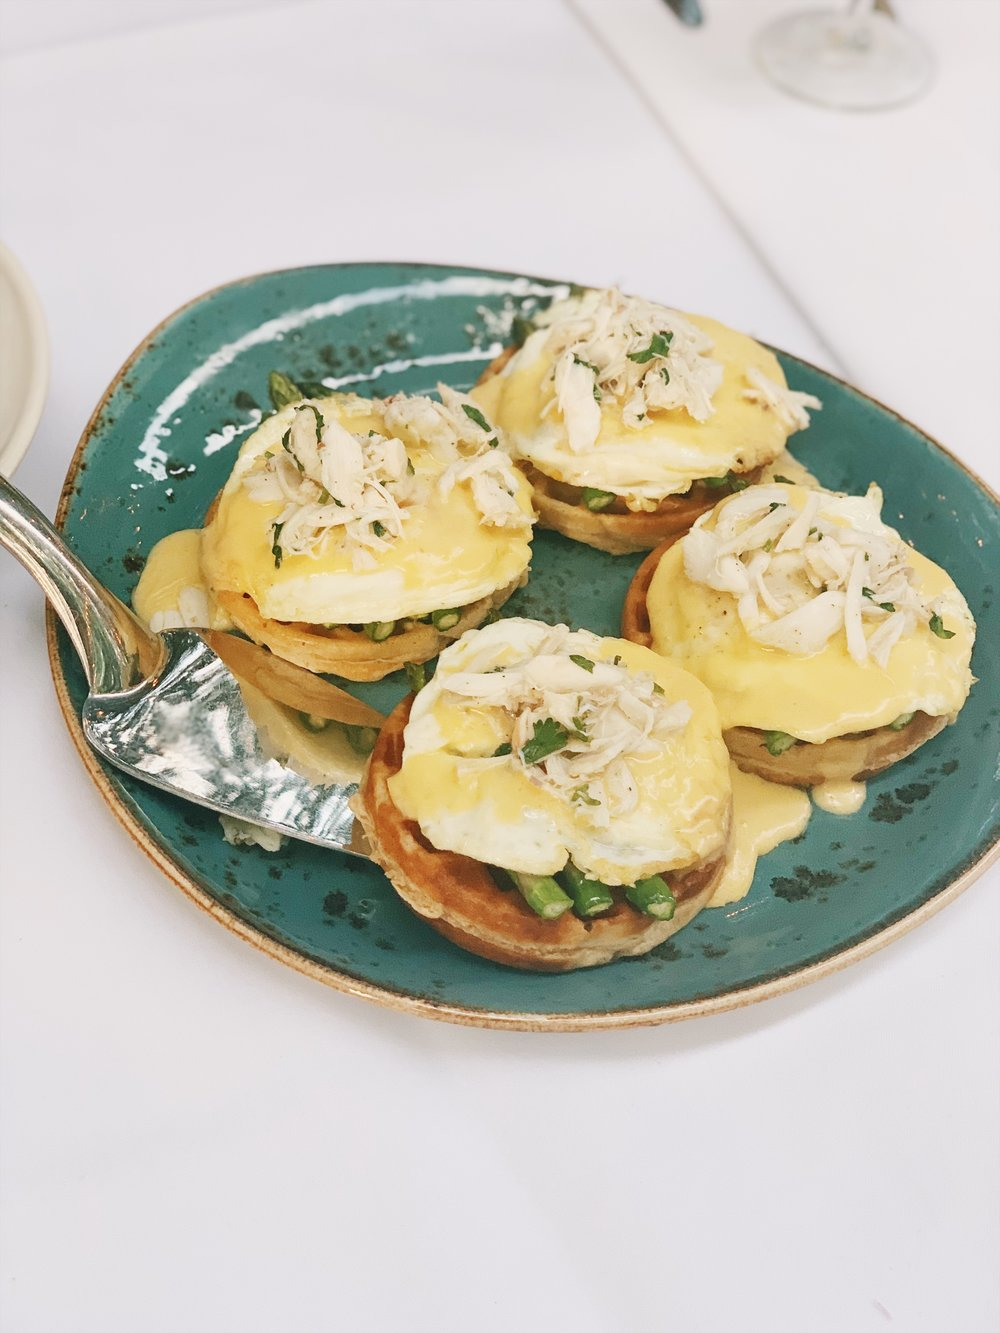 Kodiak Cake Buttermilk Waffle and Crab Oscar -